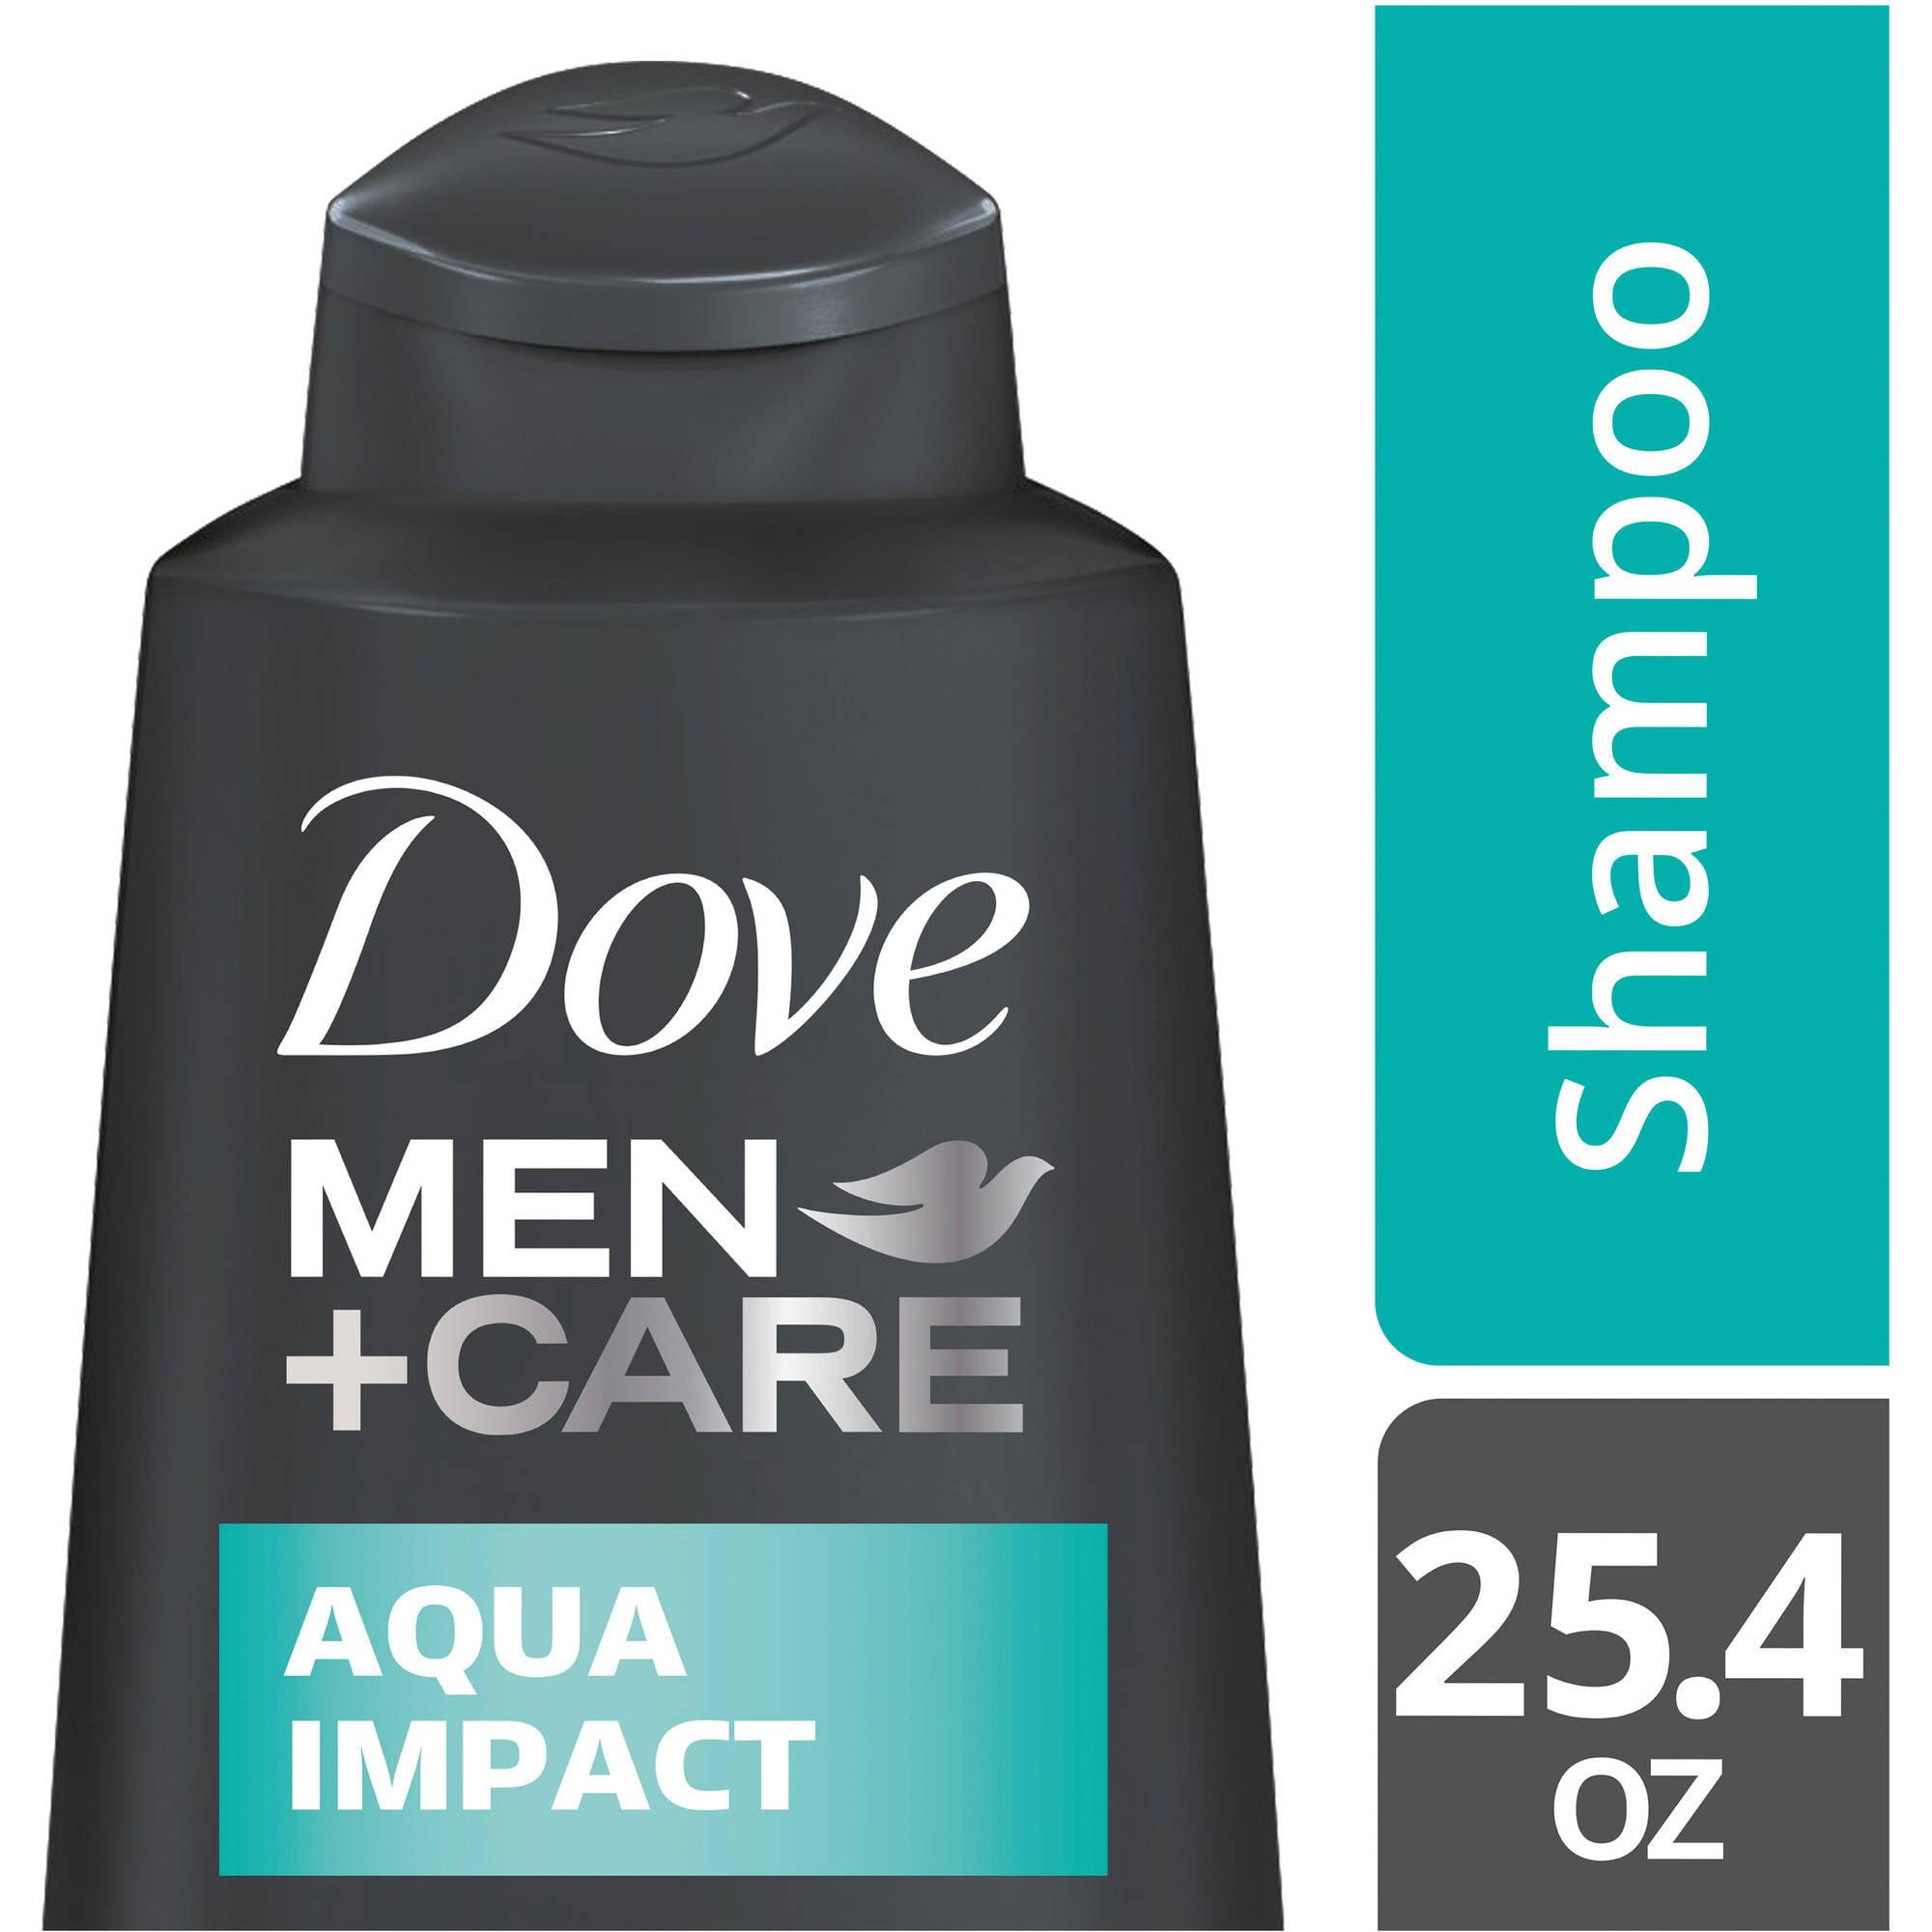 Dove Men+Care Aqua Impact Shampoo, 25.4 oz